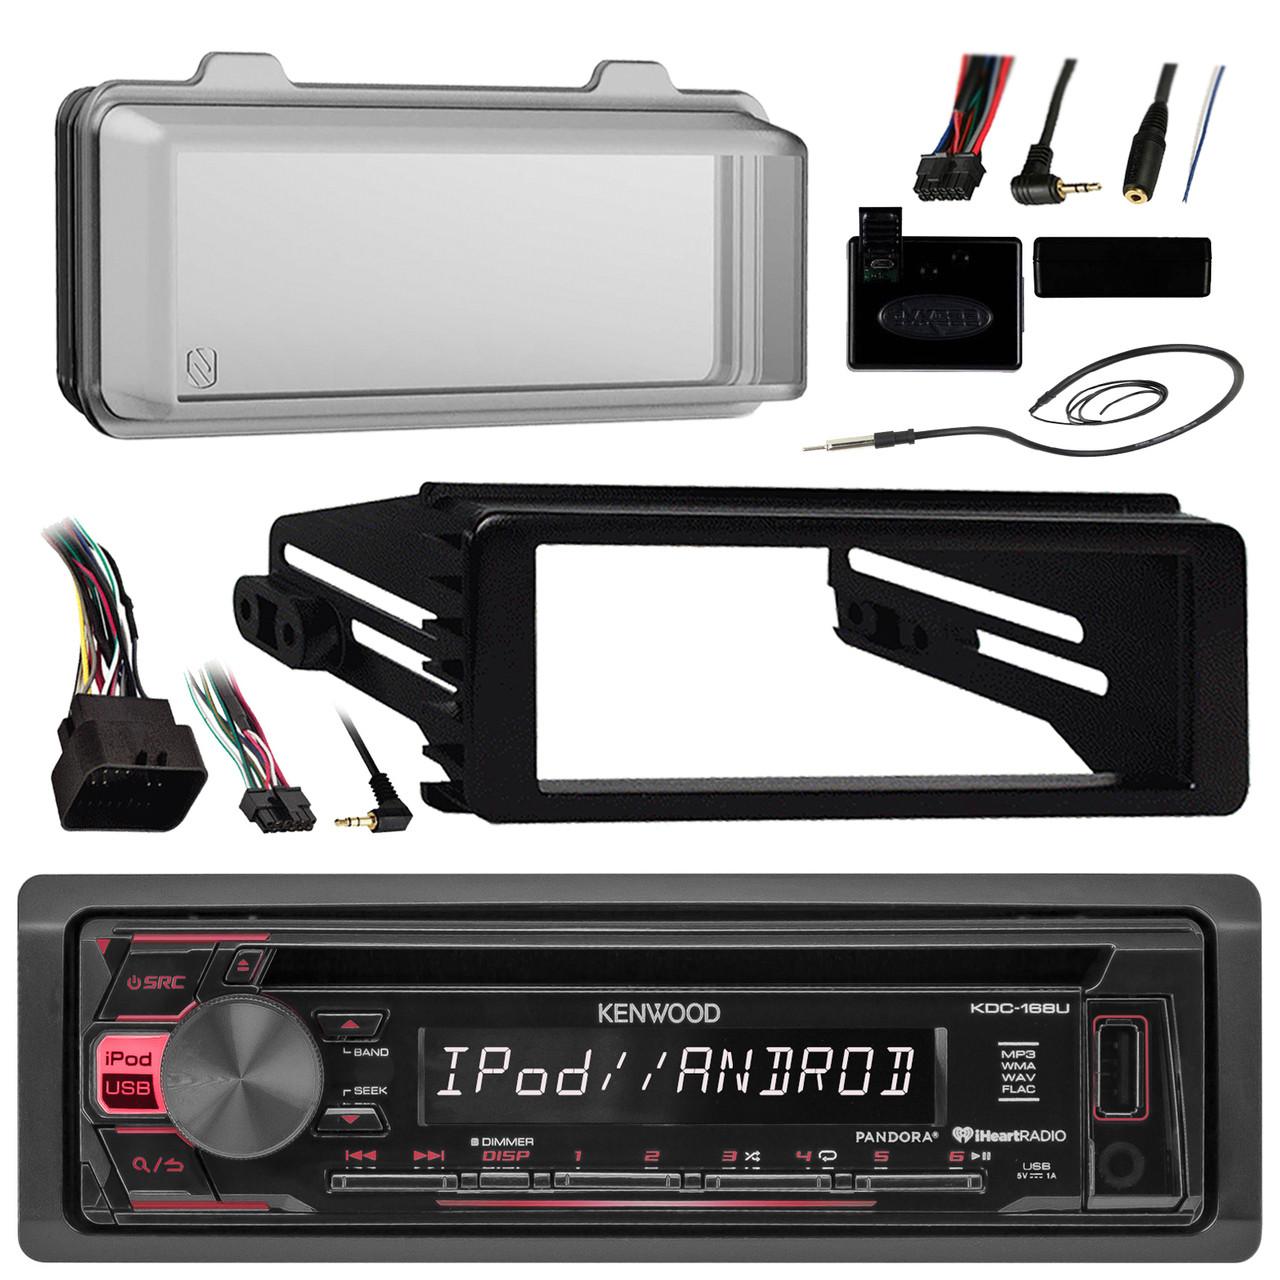 Kenwood KDC168U Radio USB AUX CD Player Receiver W/ Cover - Bundle With  Install Dash Kit + Handle Bar Control + Enrock Antenna for 98 2013 Harley